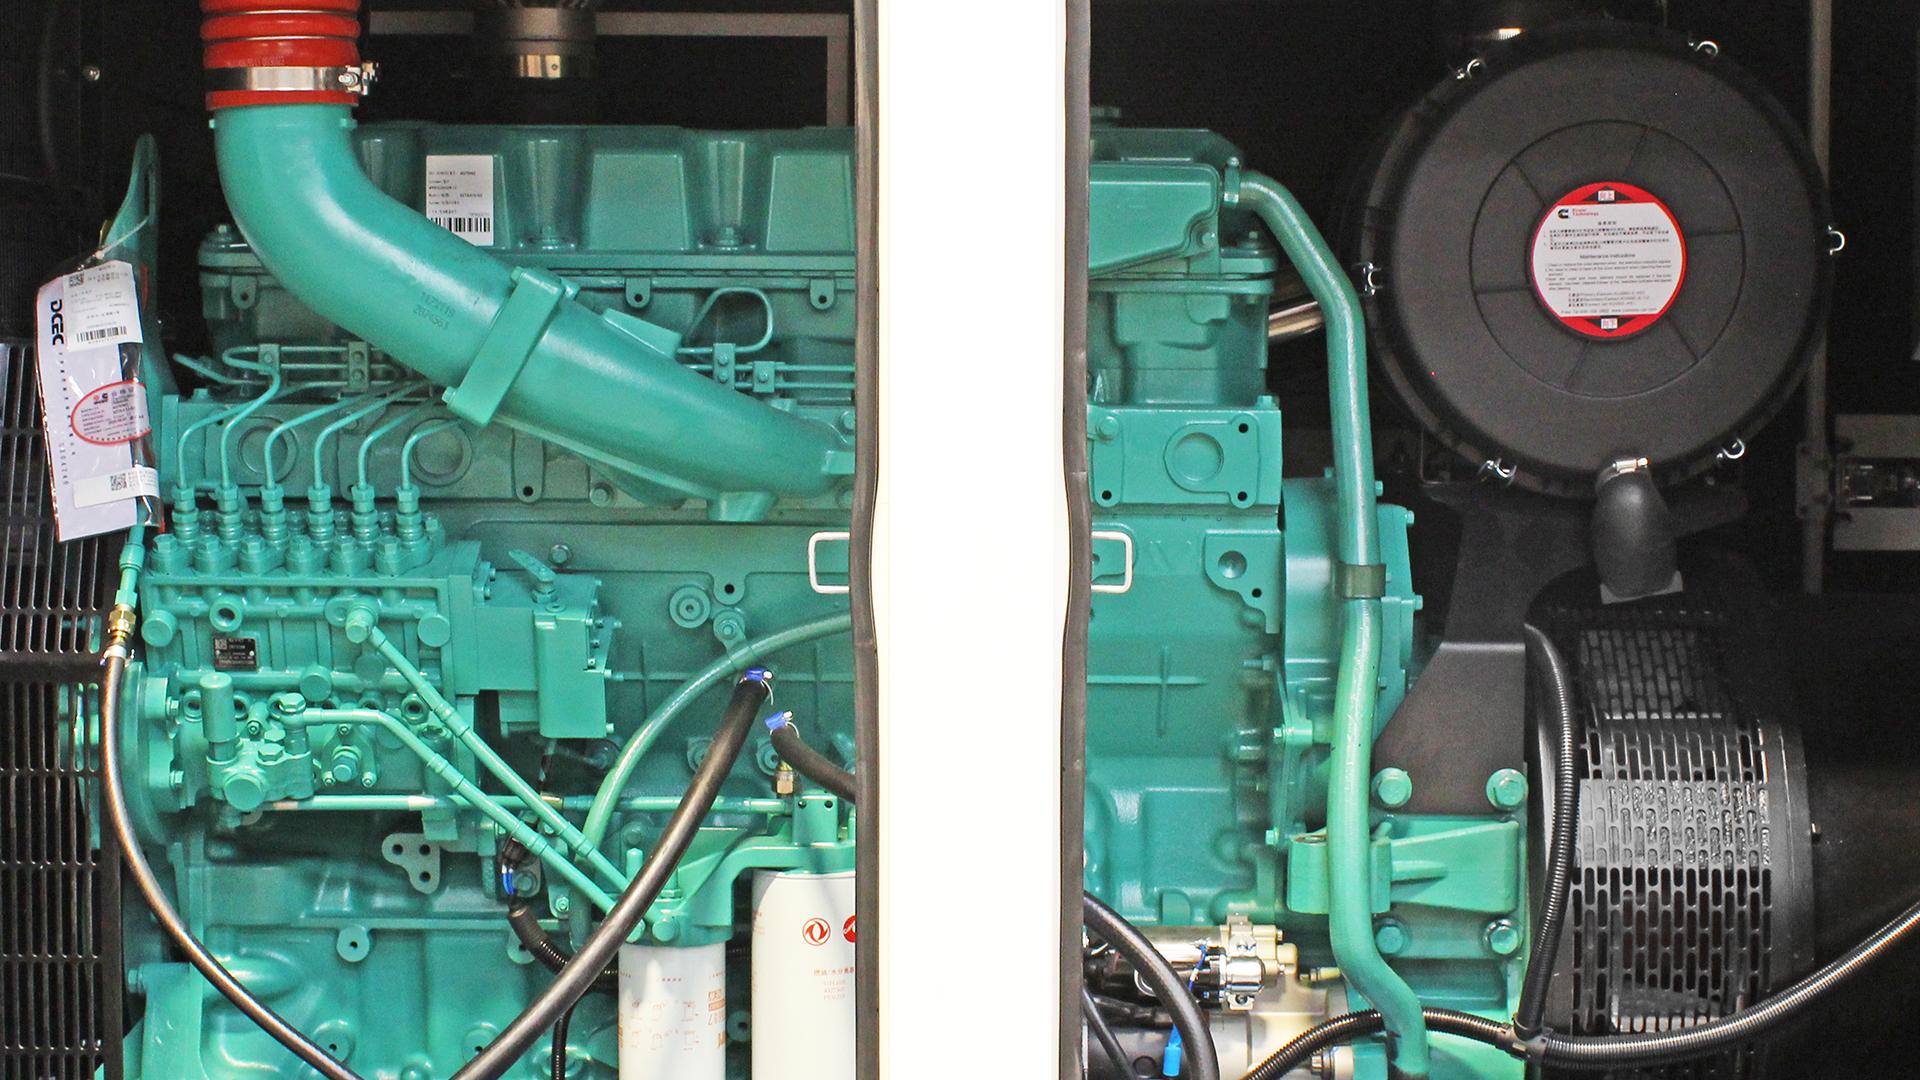 Canopy doors open on UKC480ECO generator